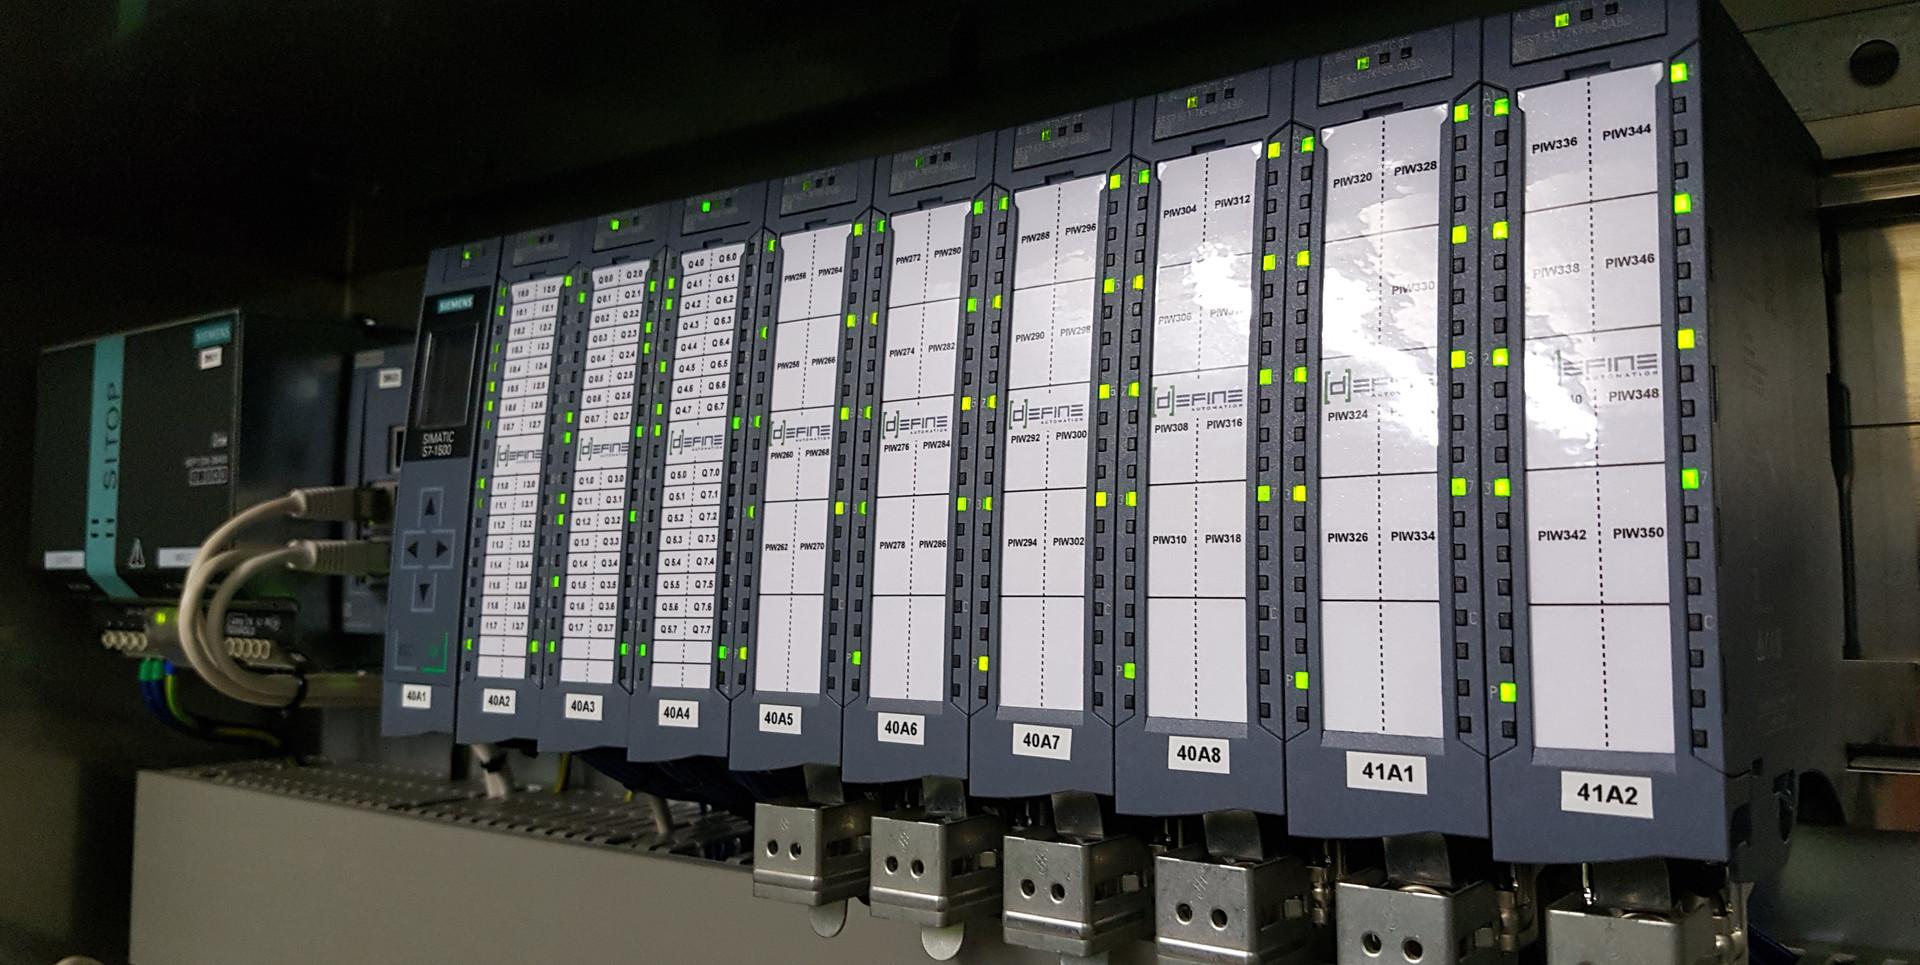 Siemens S7-1500 PLC